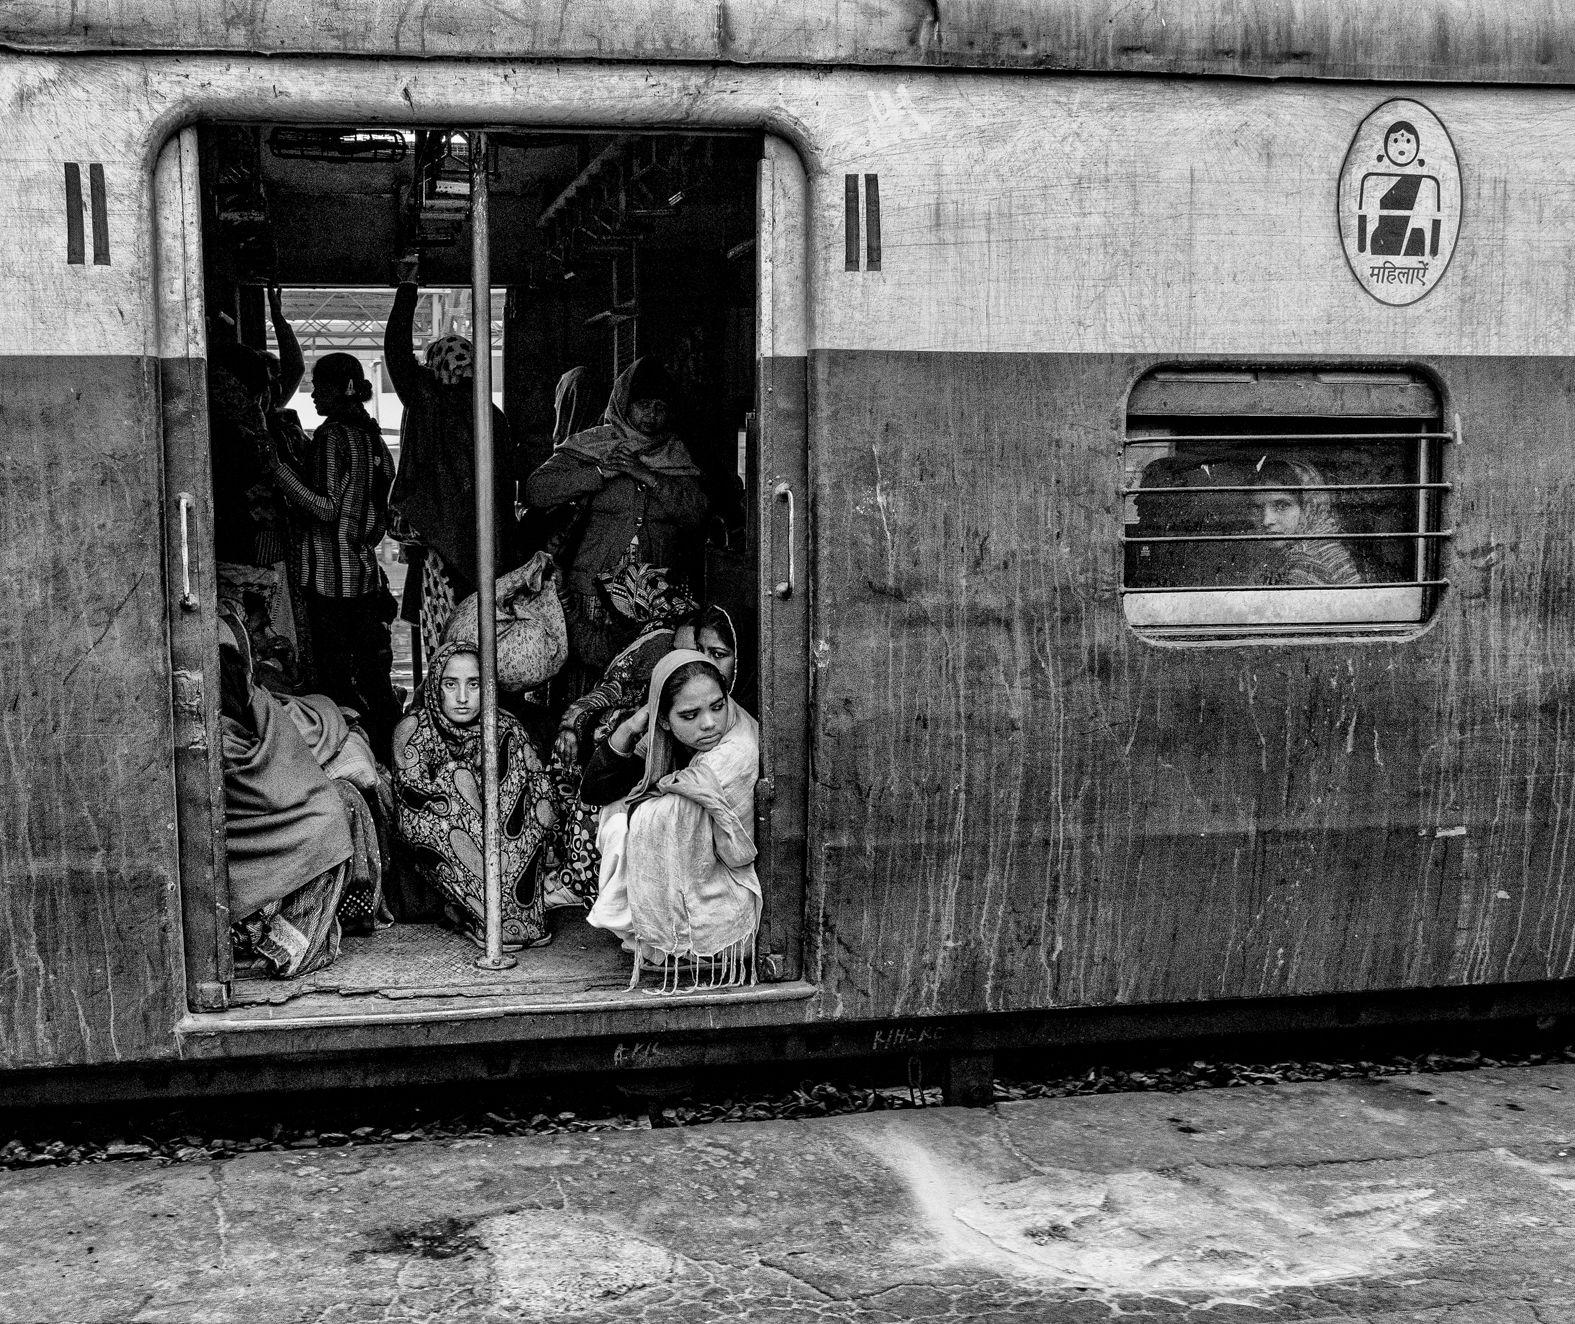 The Ladies Carriage, Delhi, January 2016